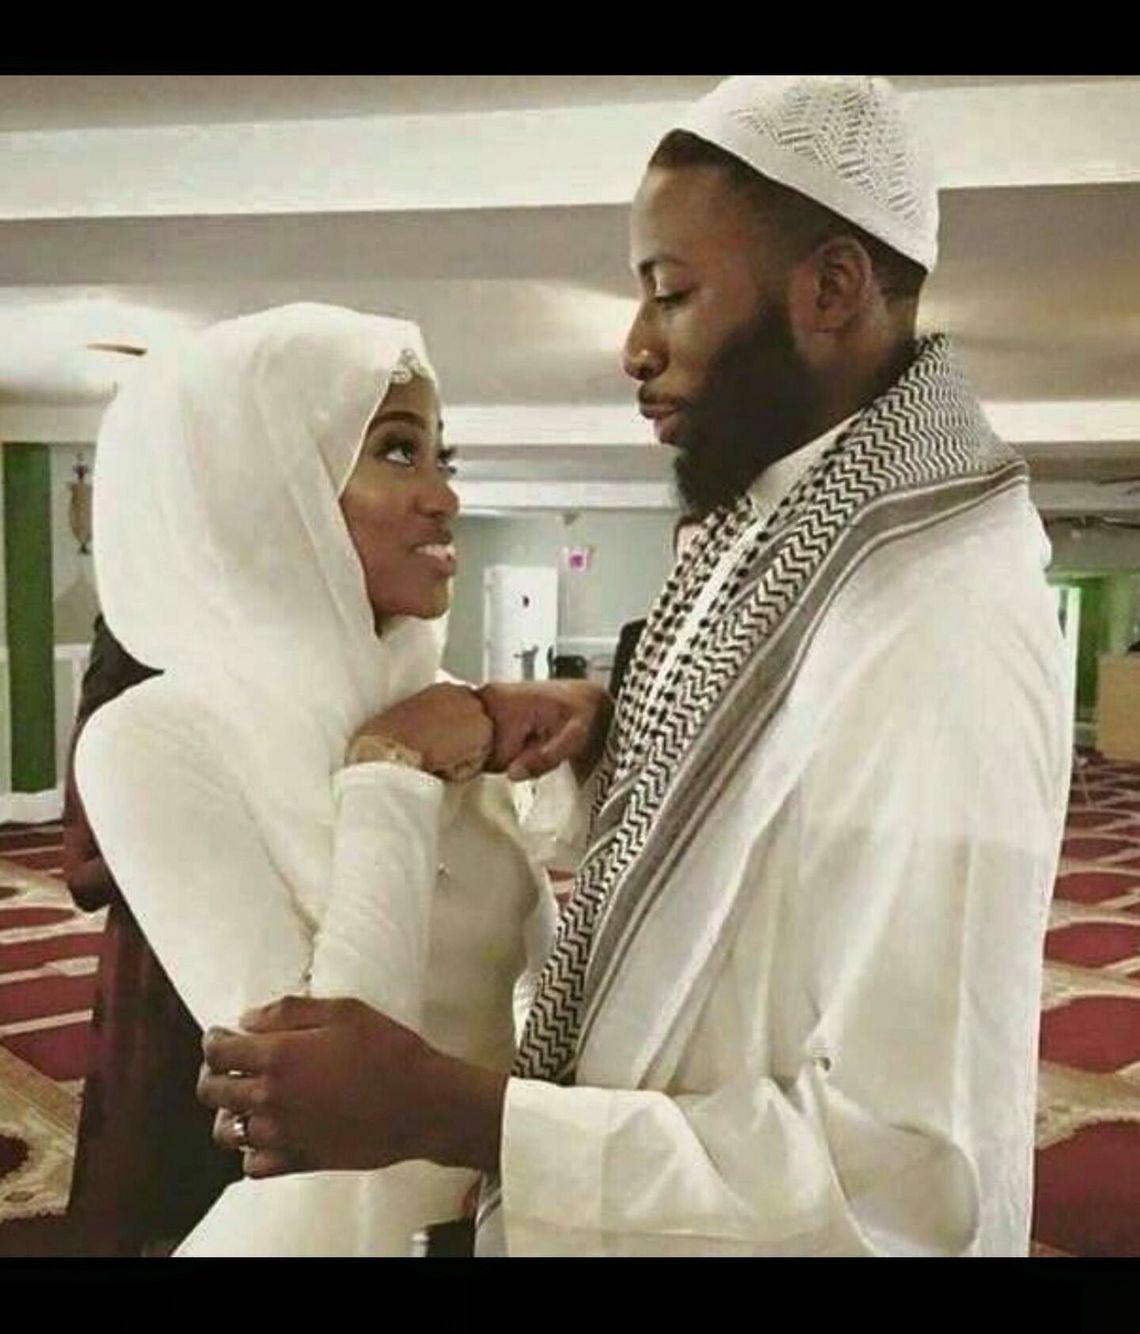 Interracial marriage in the quran